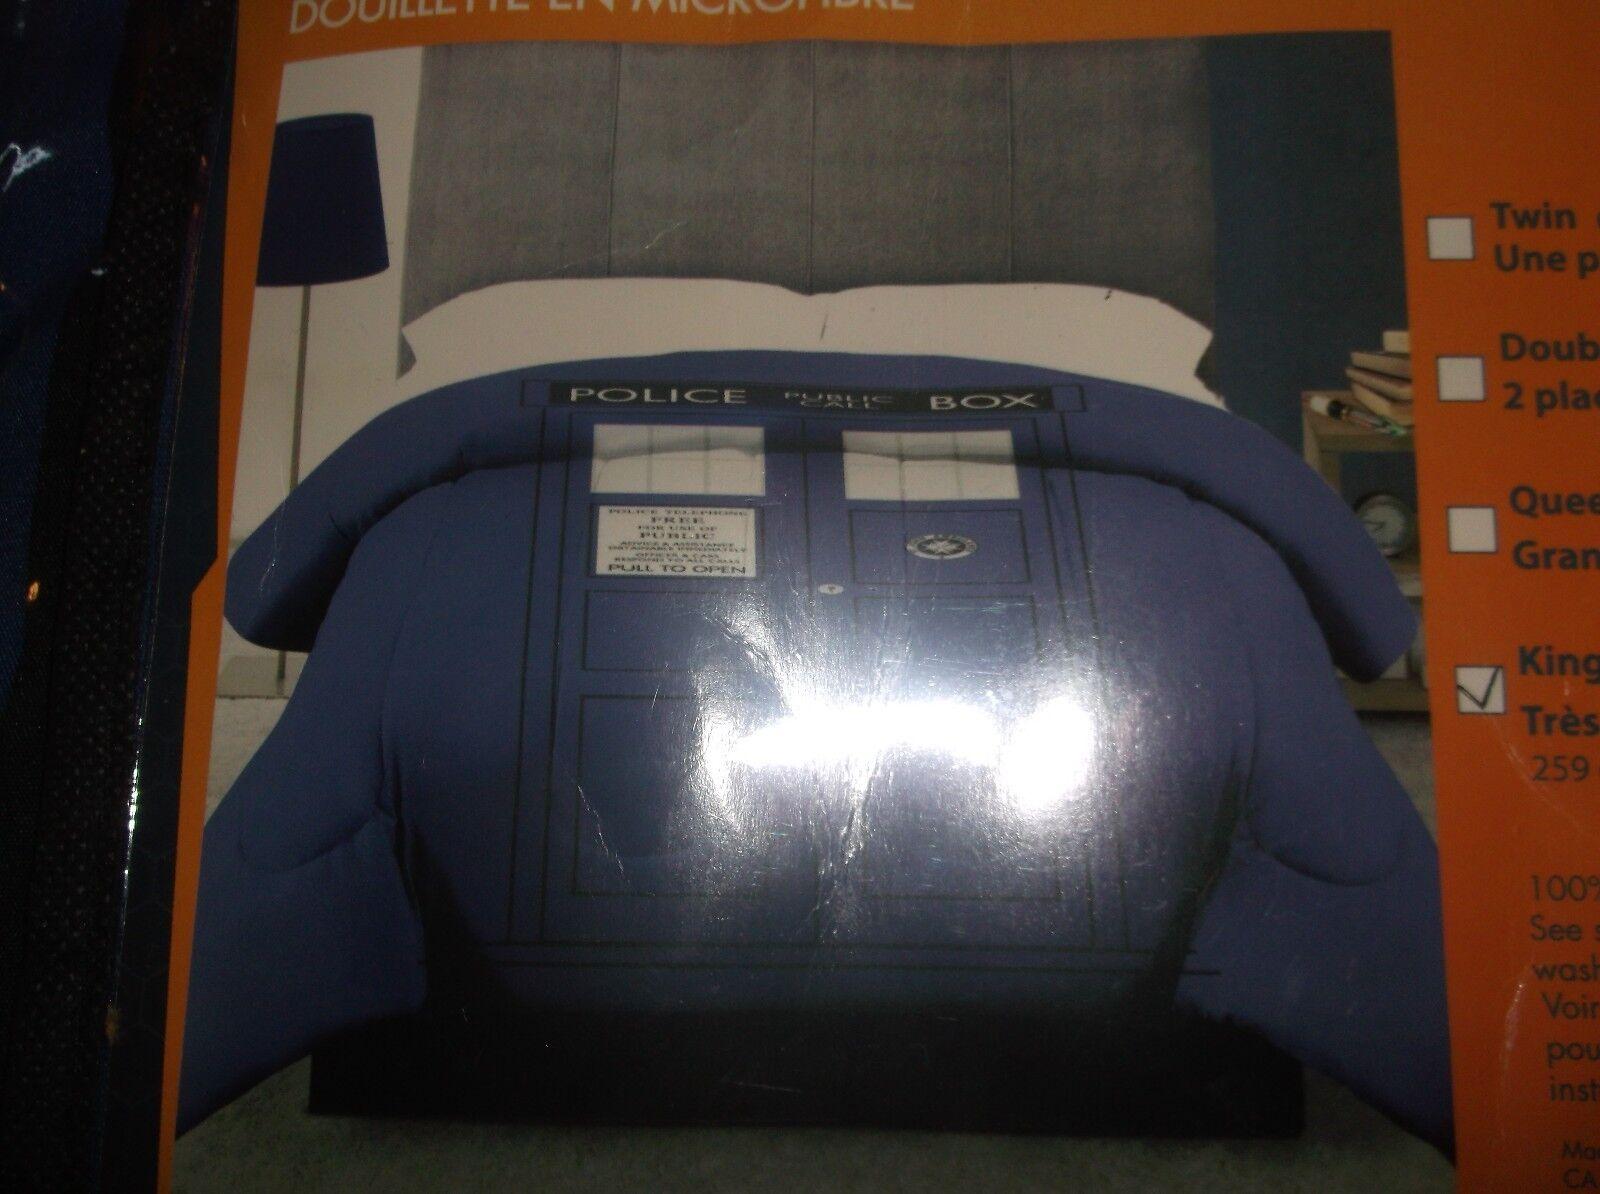 Doctor Who Tardis police box bleu roi taille lit Microfibre Couette Nouveau 102X86